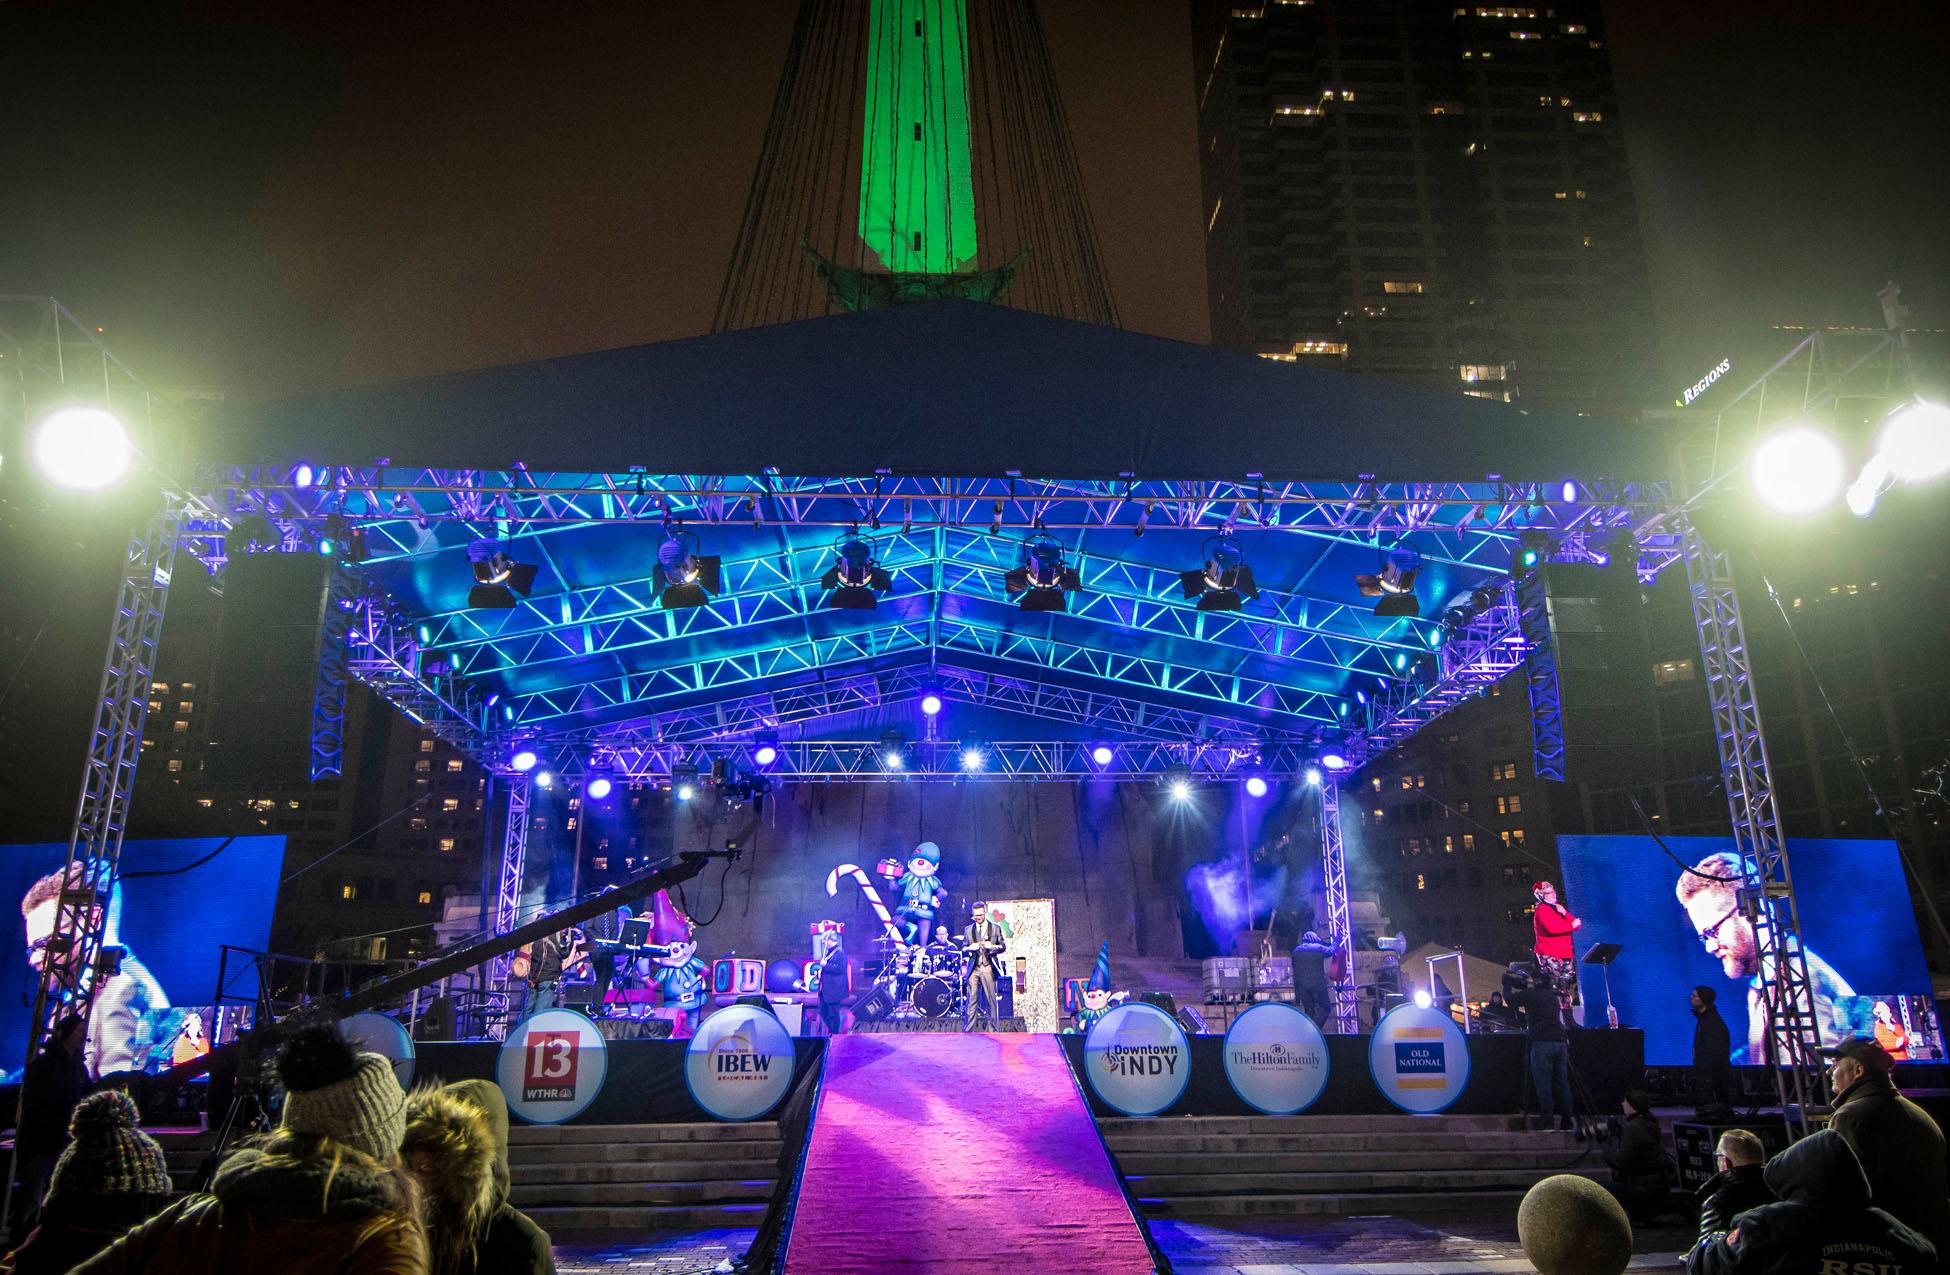 Avolites Kindles the Christmas Spirit at Indy's Circle of Lights